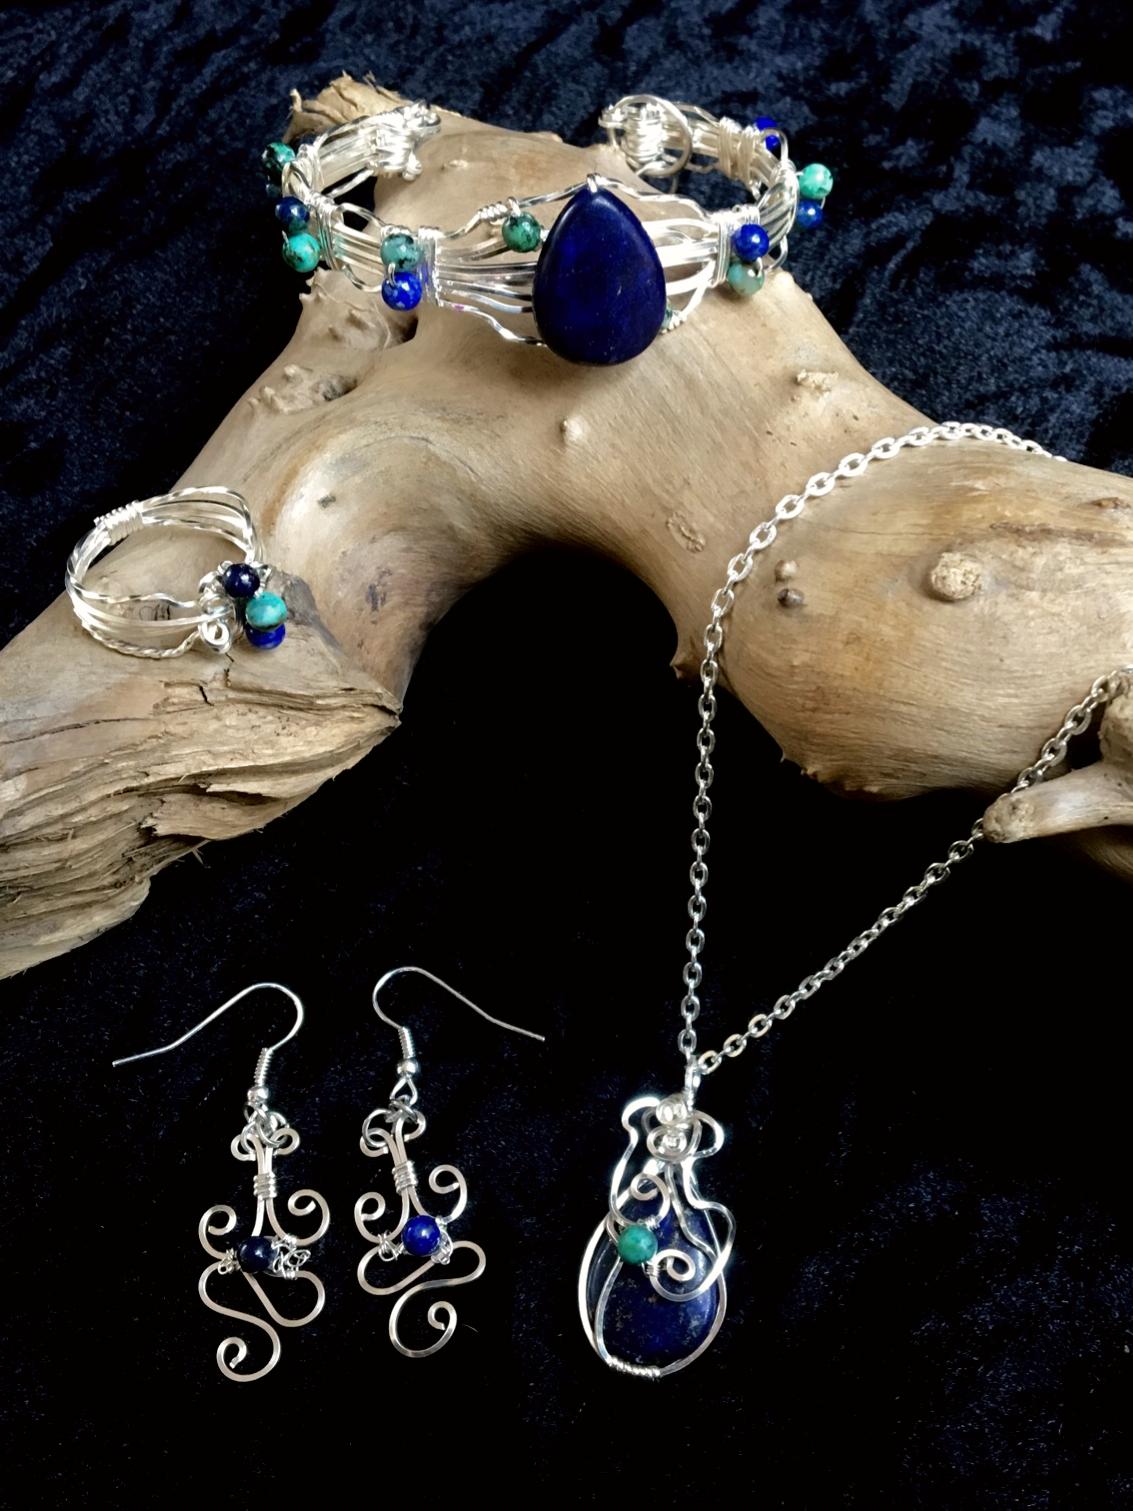 Qhresnna Quartz Set - Lapis Lazuli and Turquoise- Silver Plated